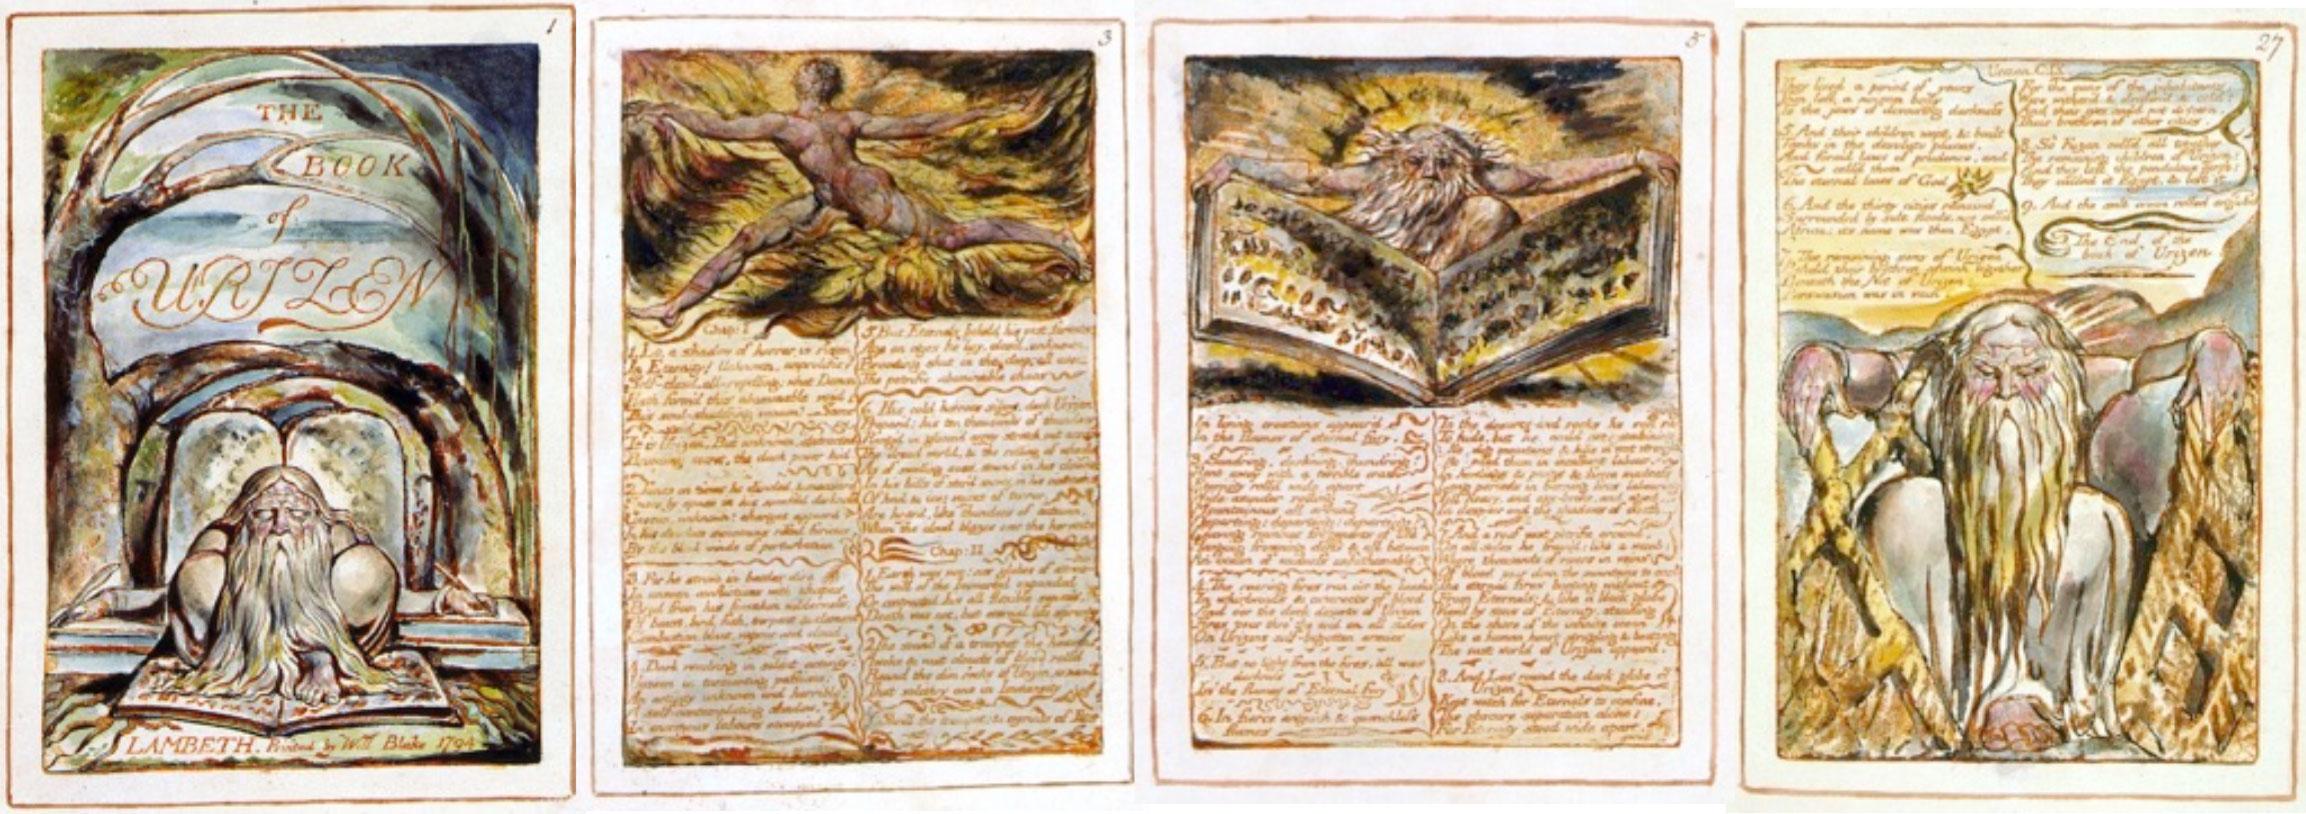 William Blake,  The Book of Urizen  (1794)